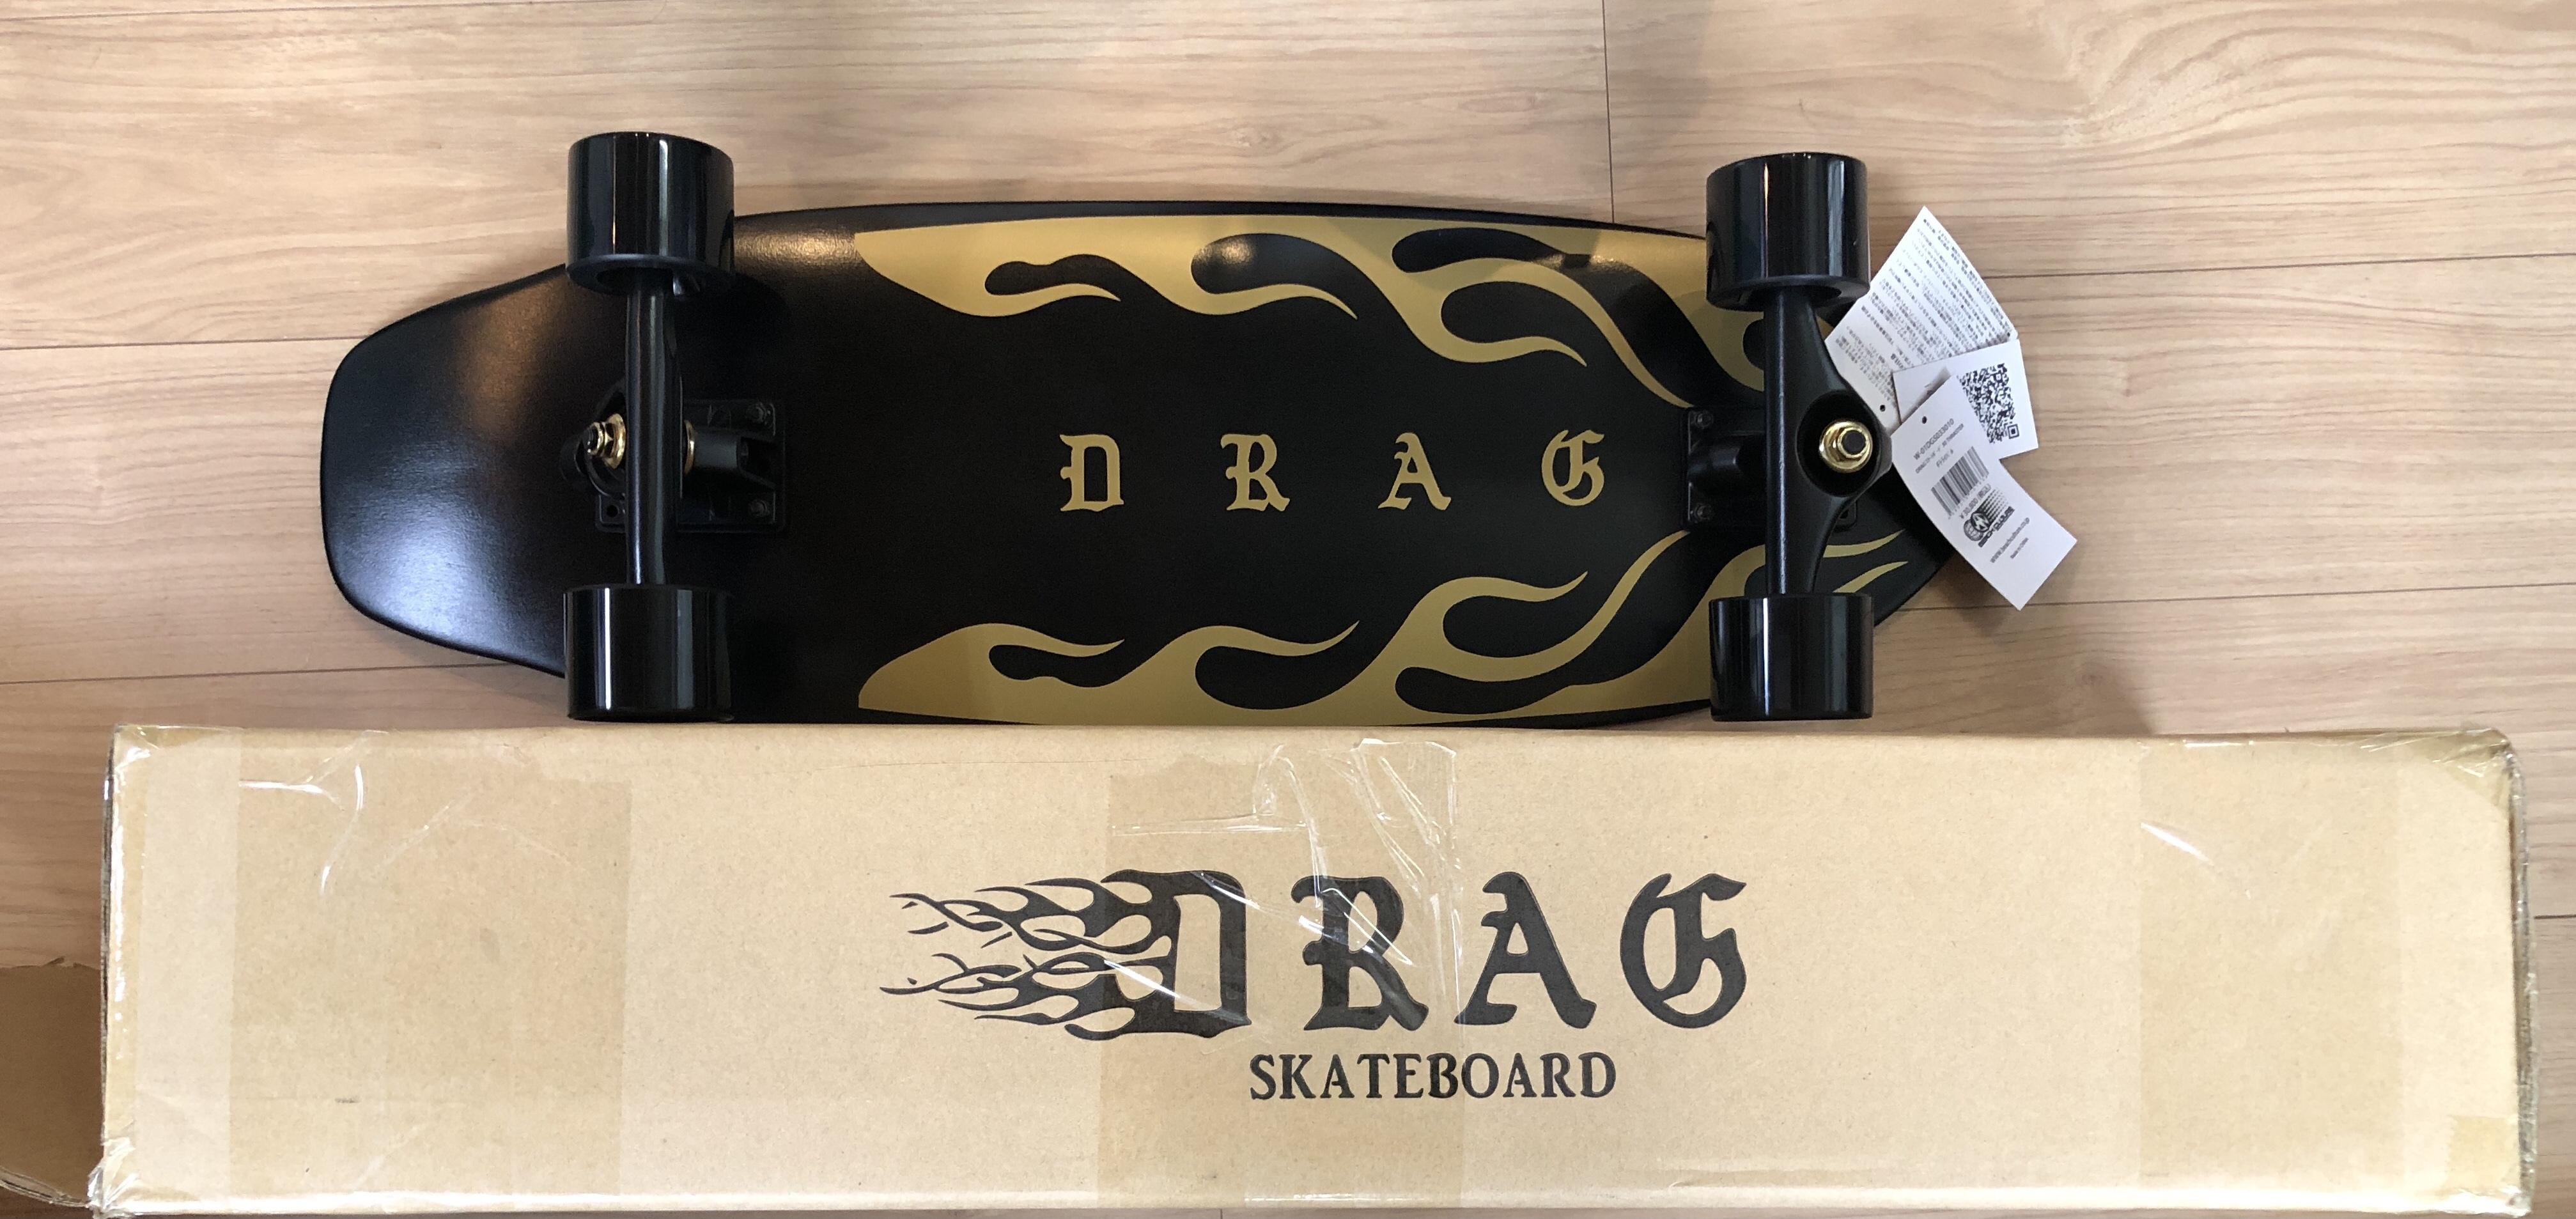 DRAG スケートボード 30 THRASTER(Fトライバル)